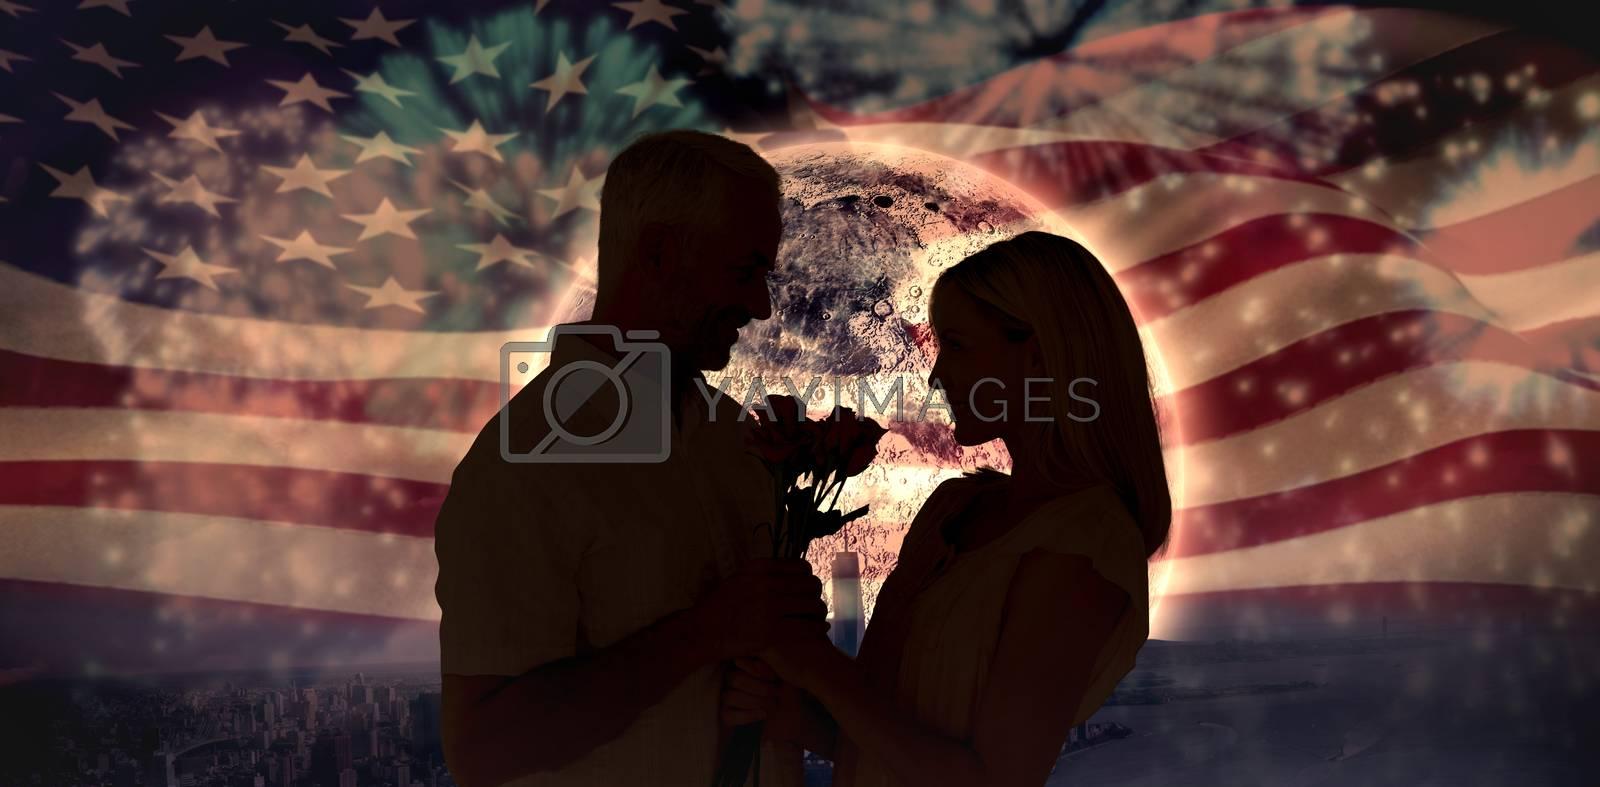 Affectionate man offering his partner roses against colourful fireworks exploding on black background